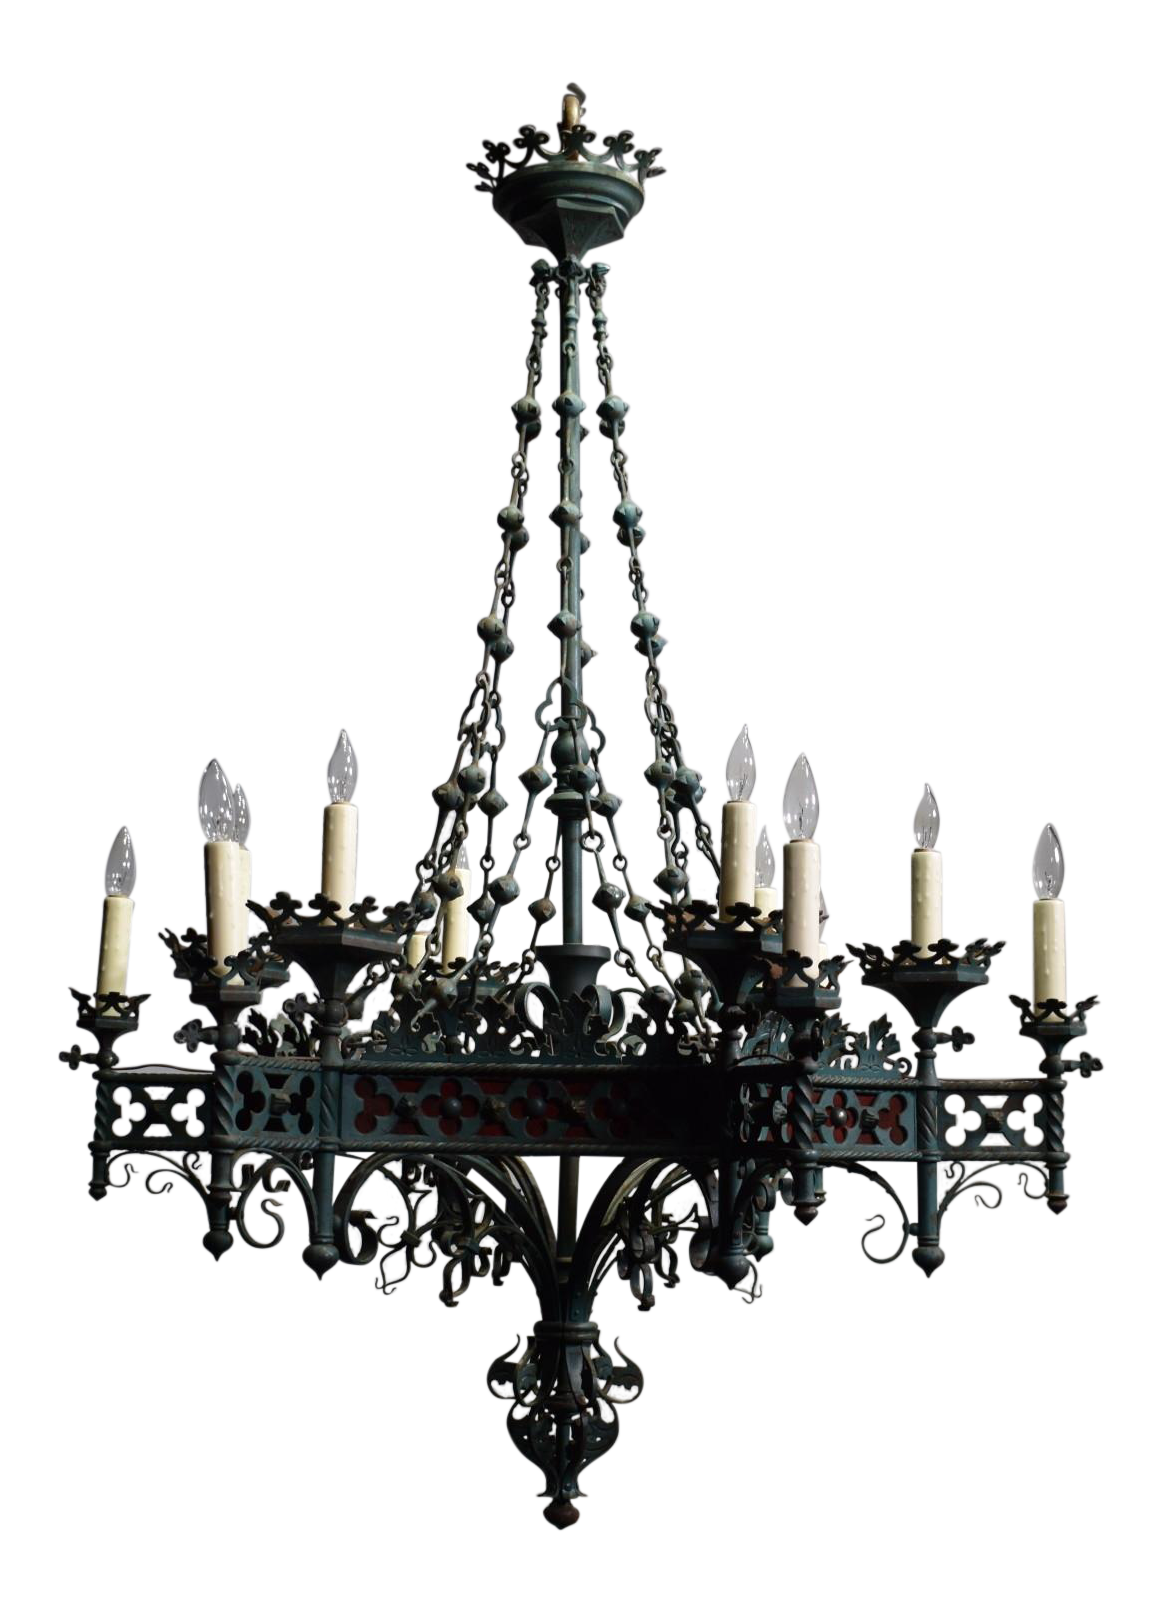 Antique chandelier, Gothic Revival period - Antique & Designer Gothic Chandeliers DECASO